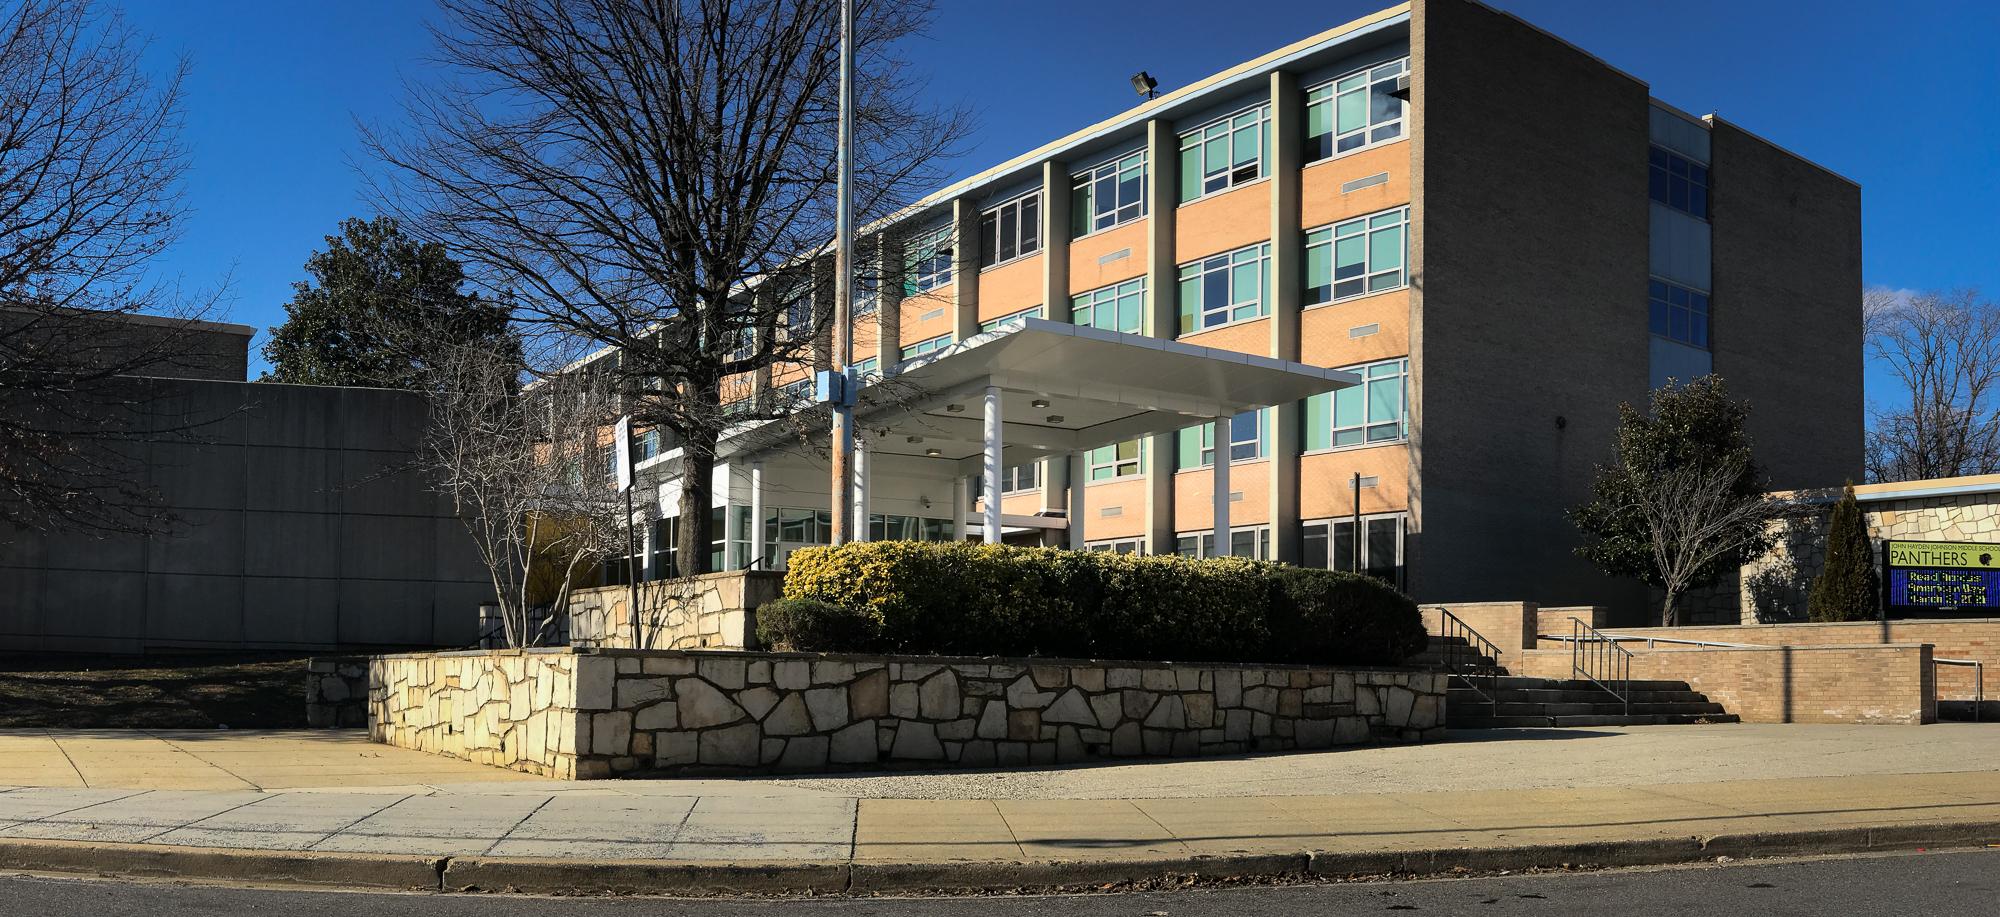 Exterior of John Hayden Johnson Middle School